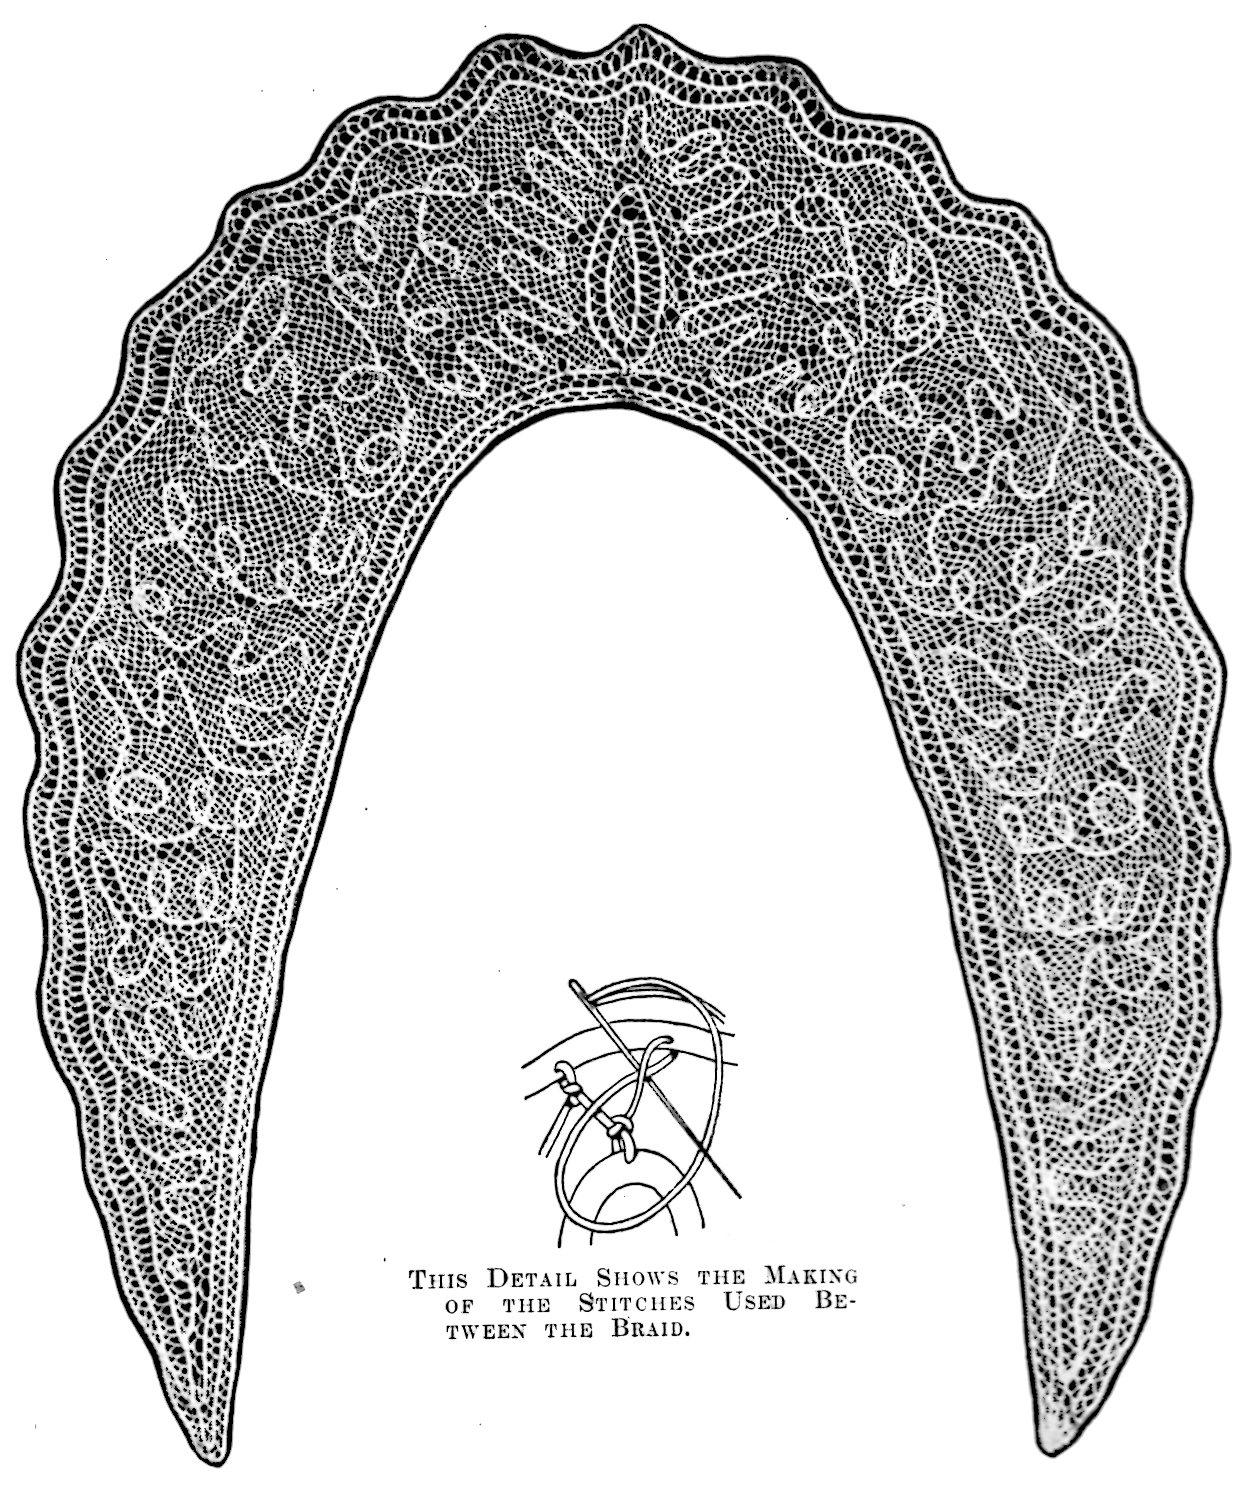 Lace Wonderful Lace!! Vintage Article on Bohemian Lace